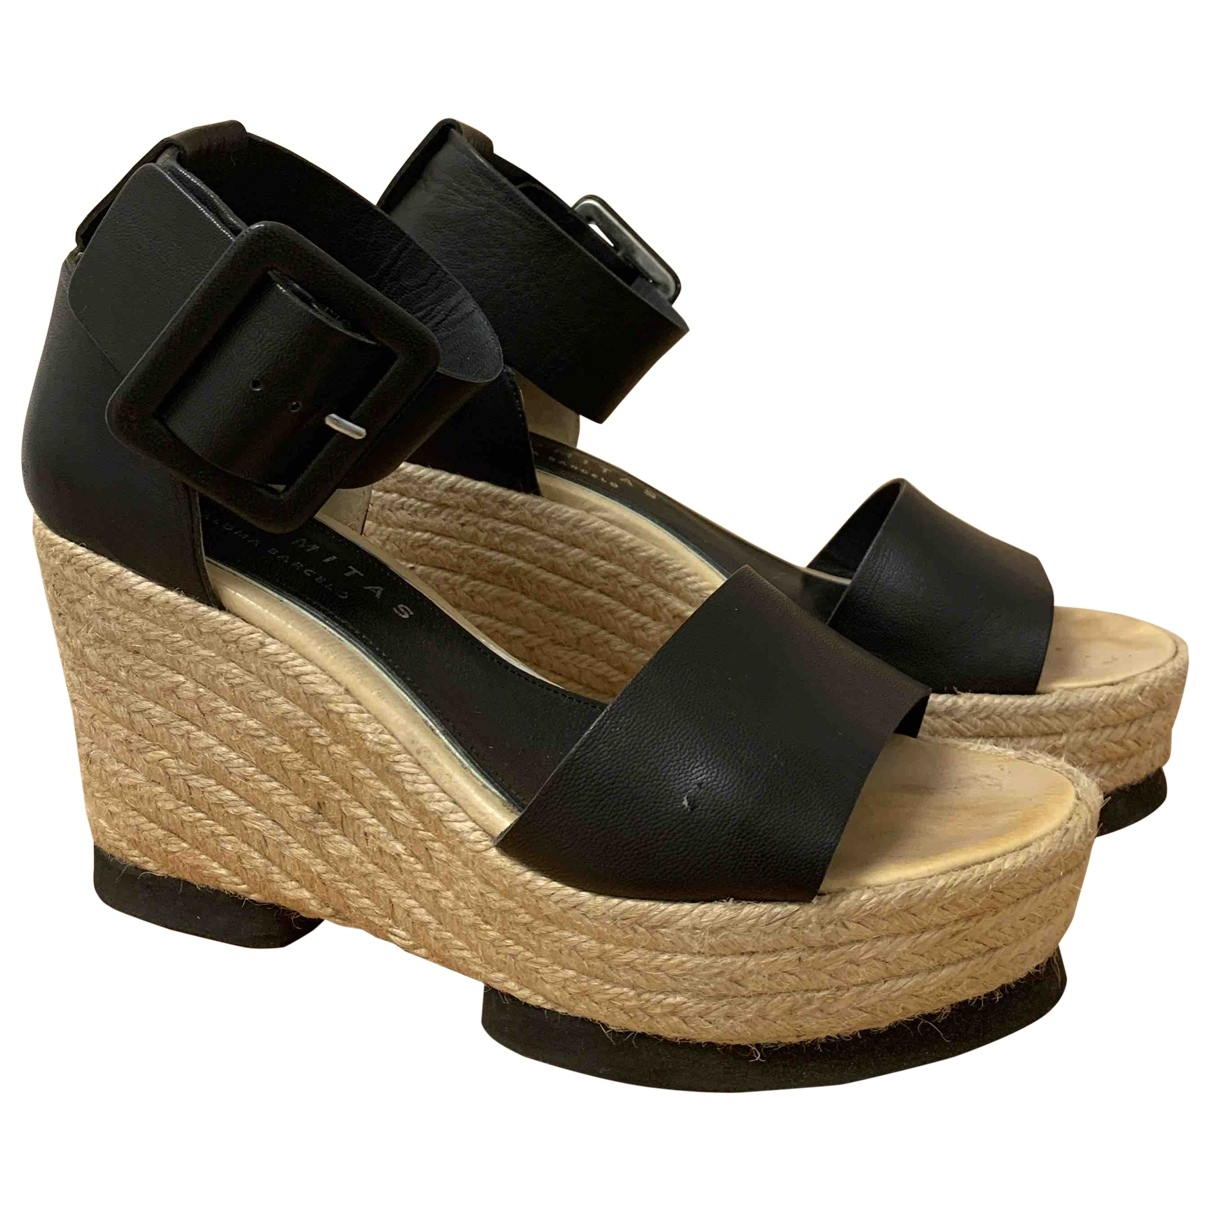 Paloma Barcelo \N Black Leather Sandals for Women 40 EU